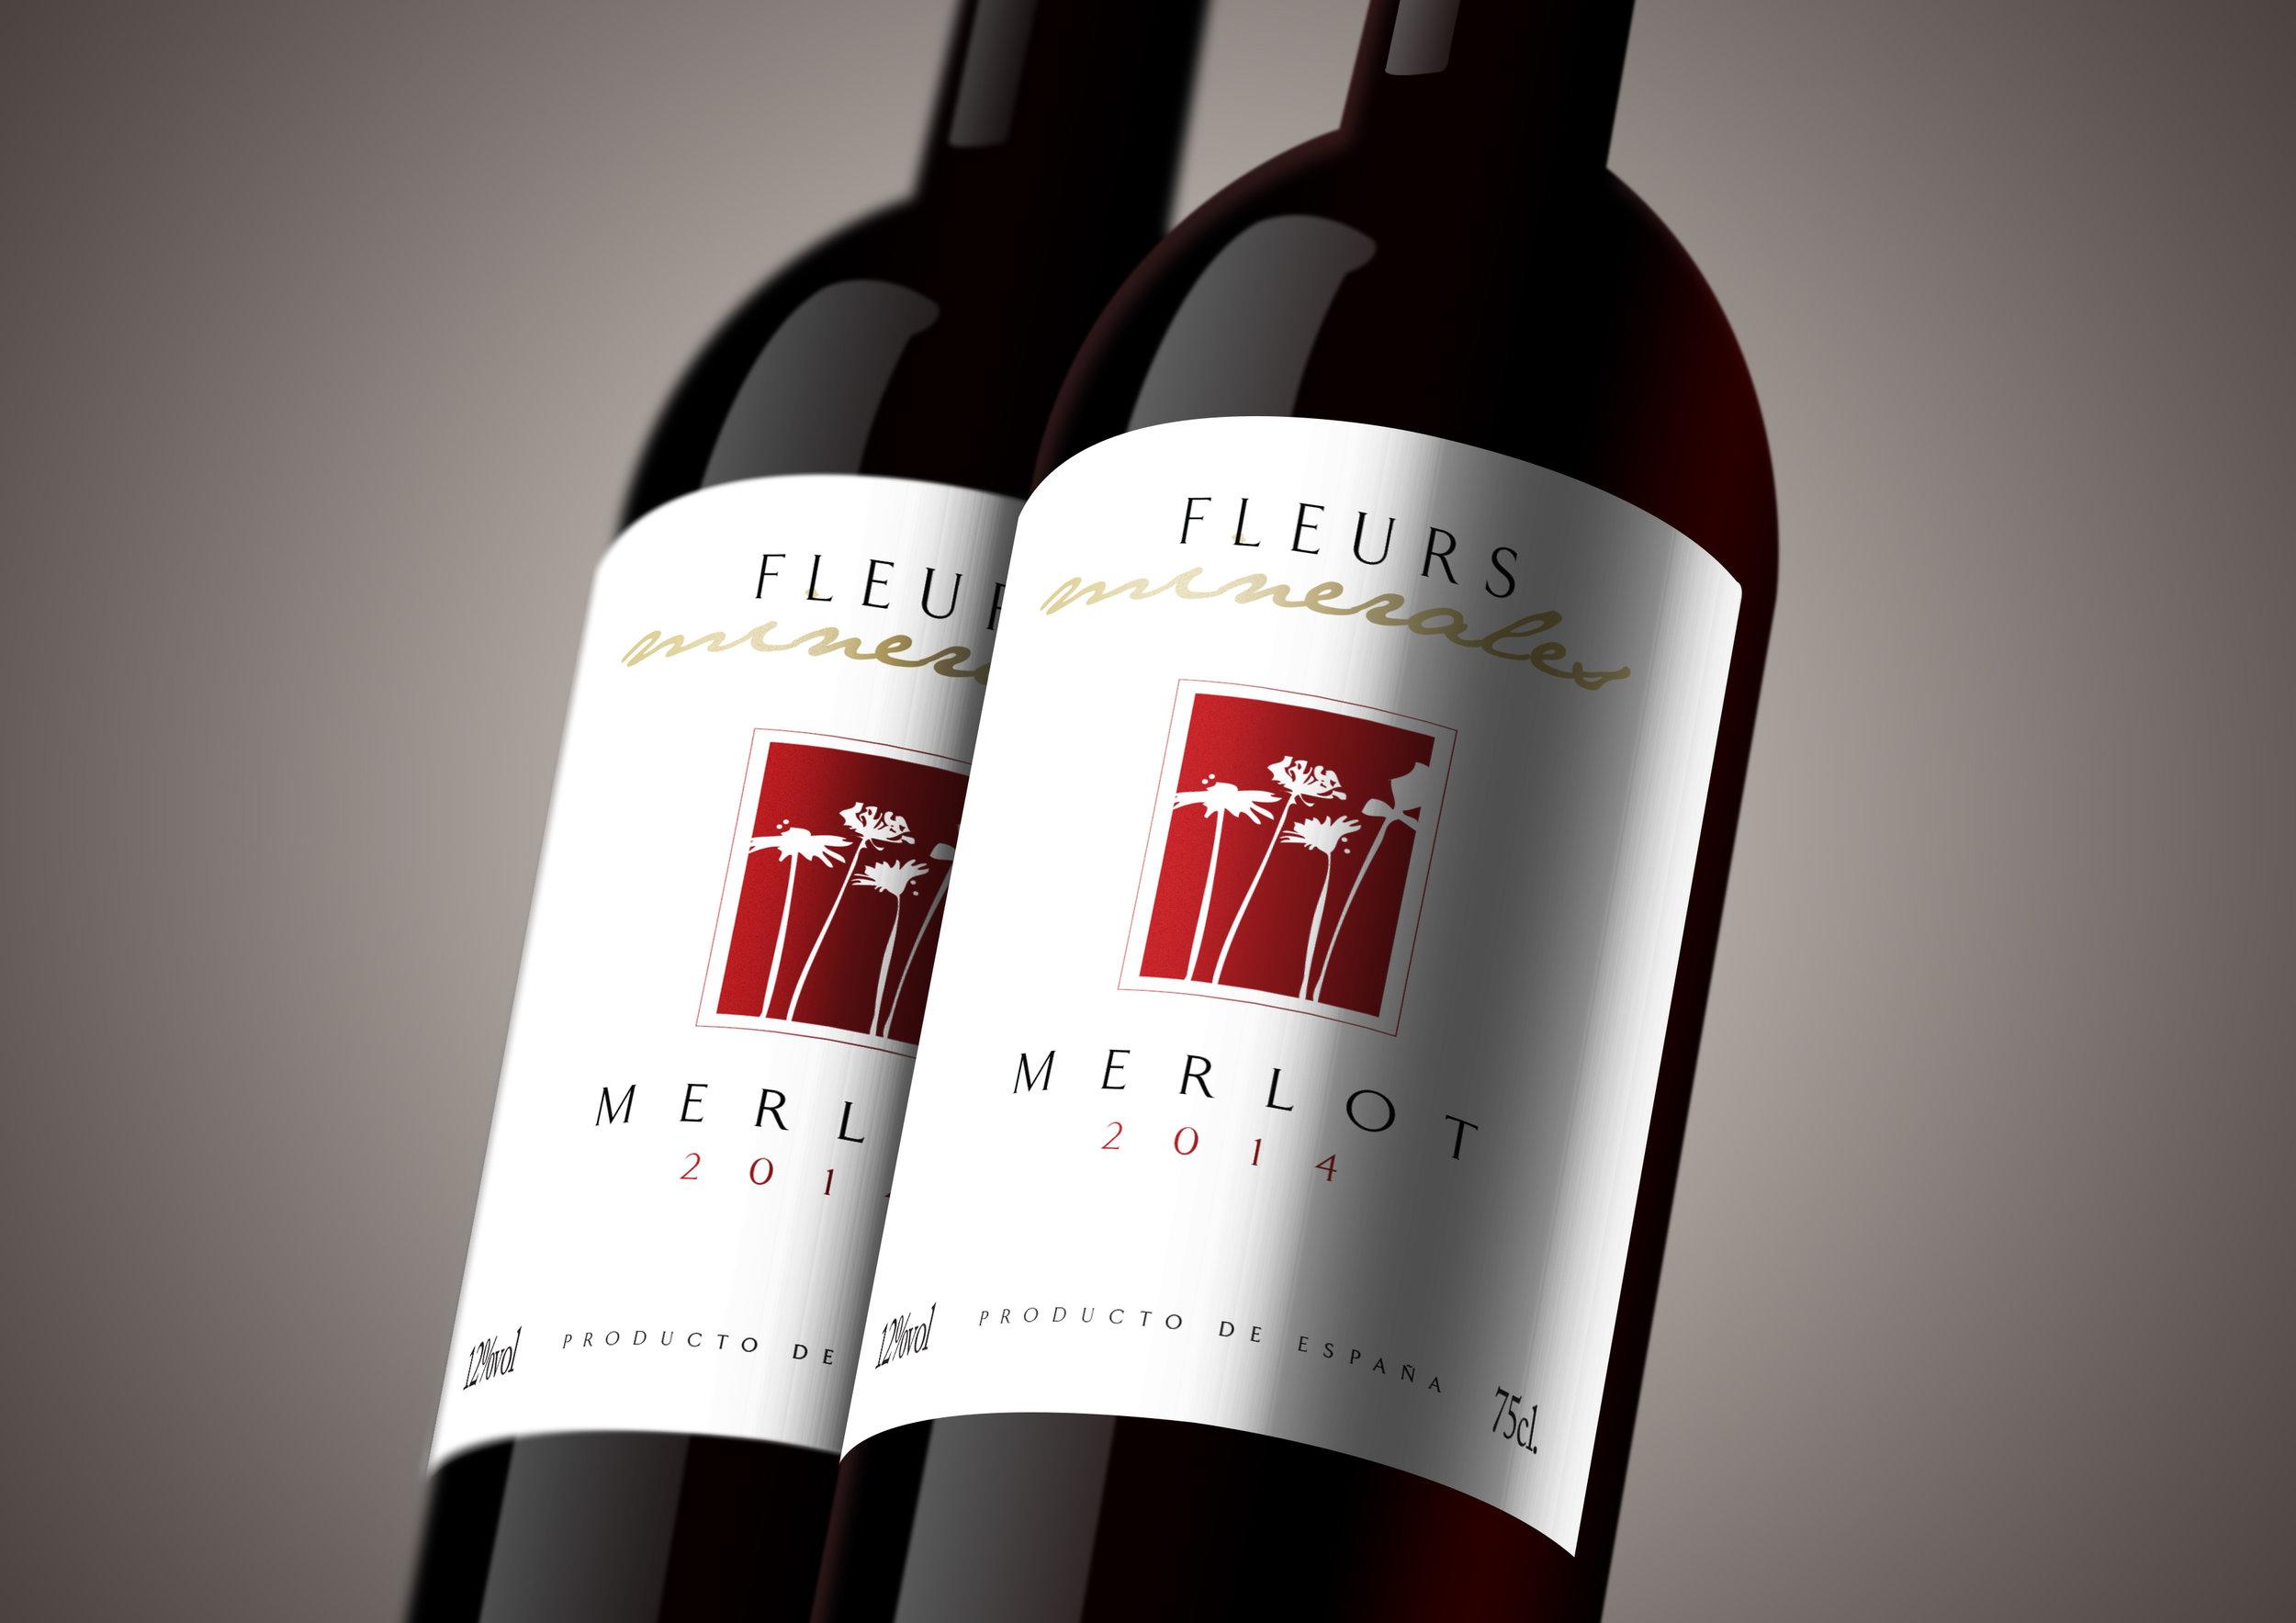 Fleaurs Minerales 2 bottle shot.jpg